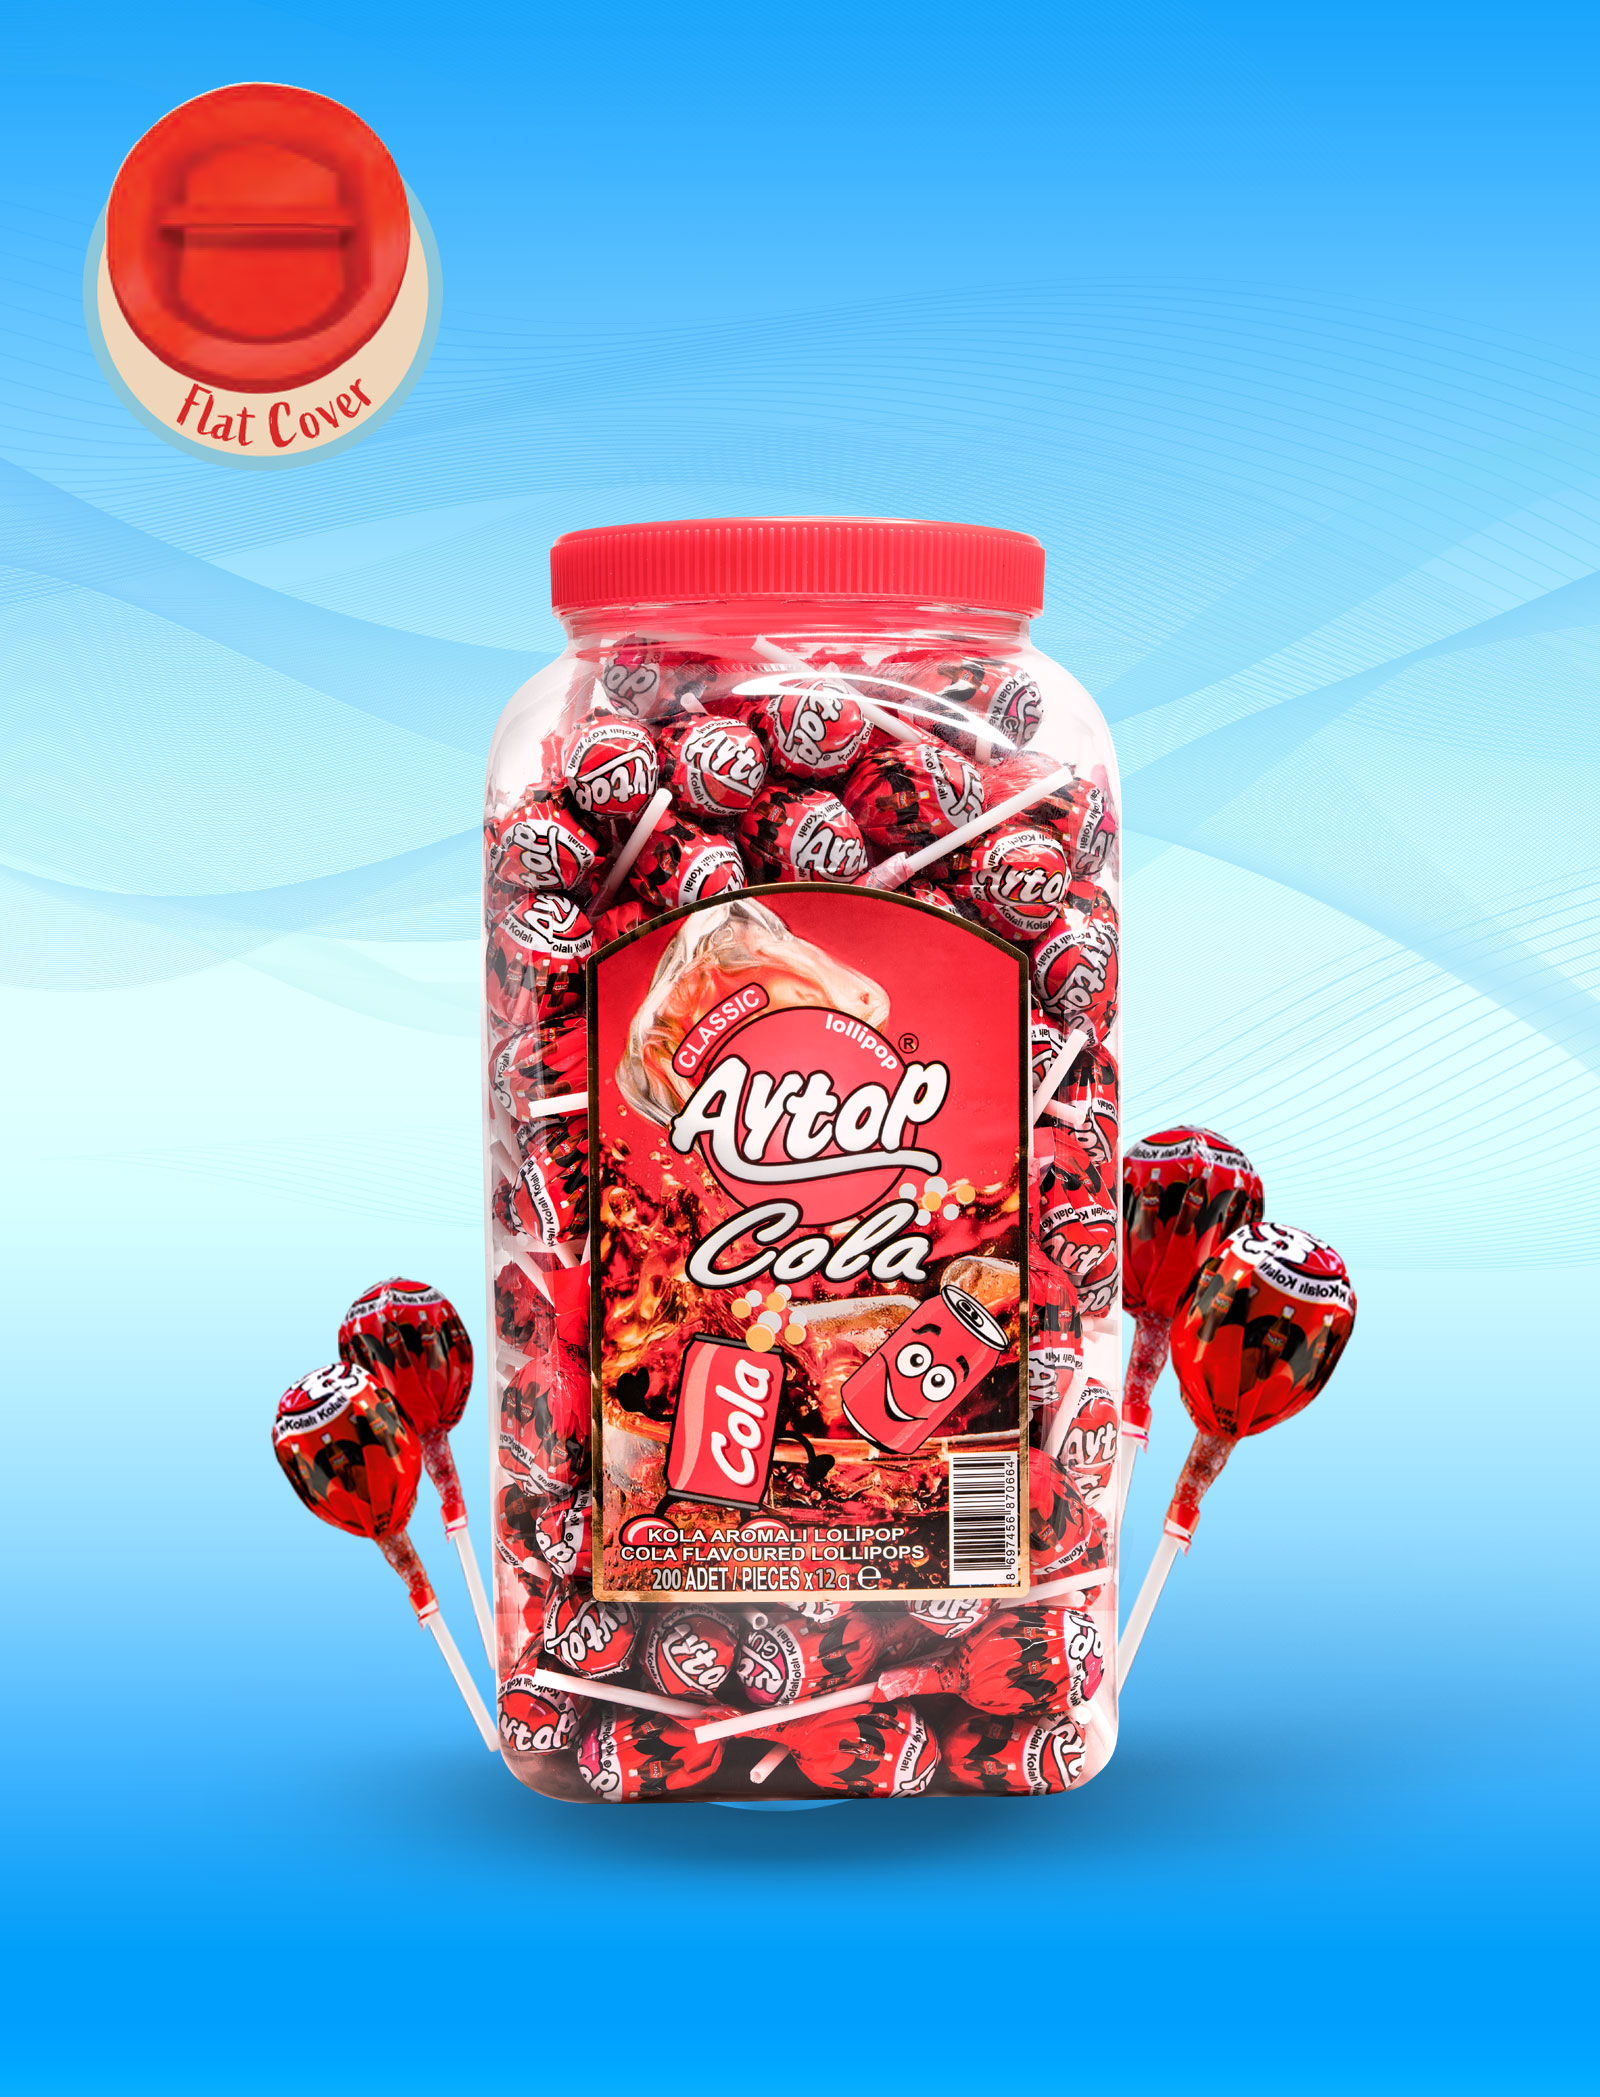 Aytop Cola